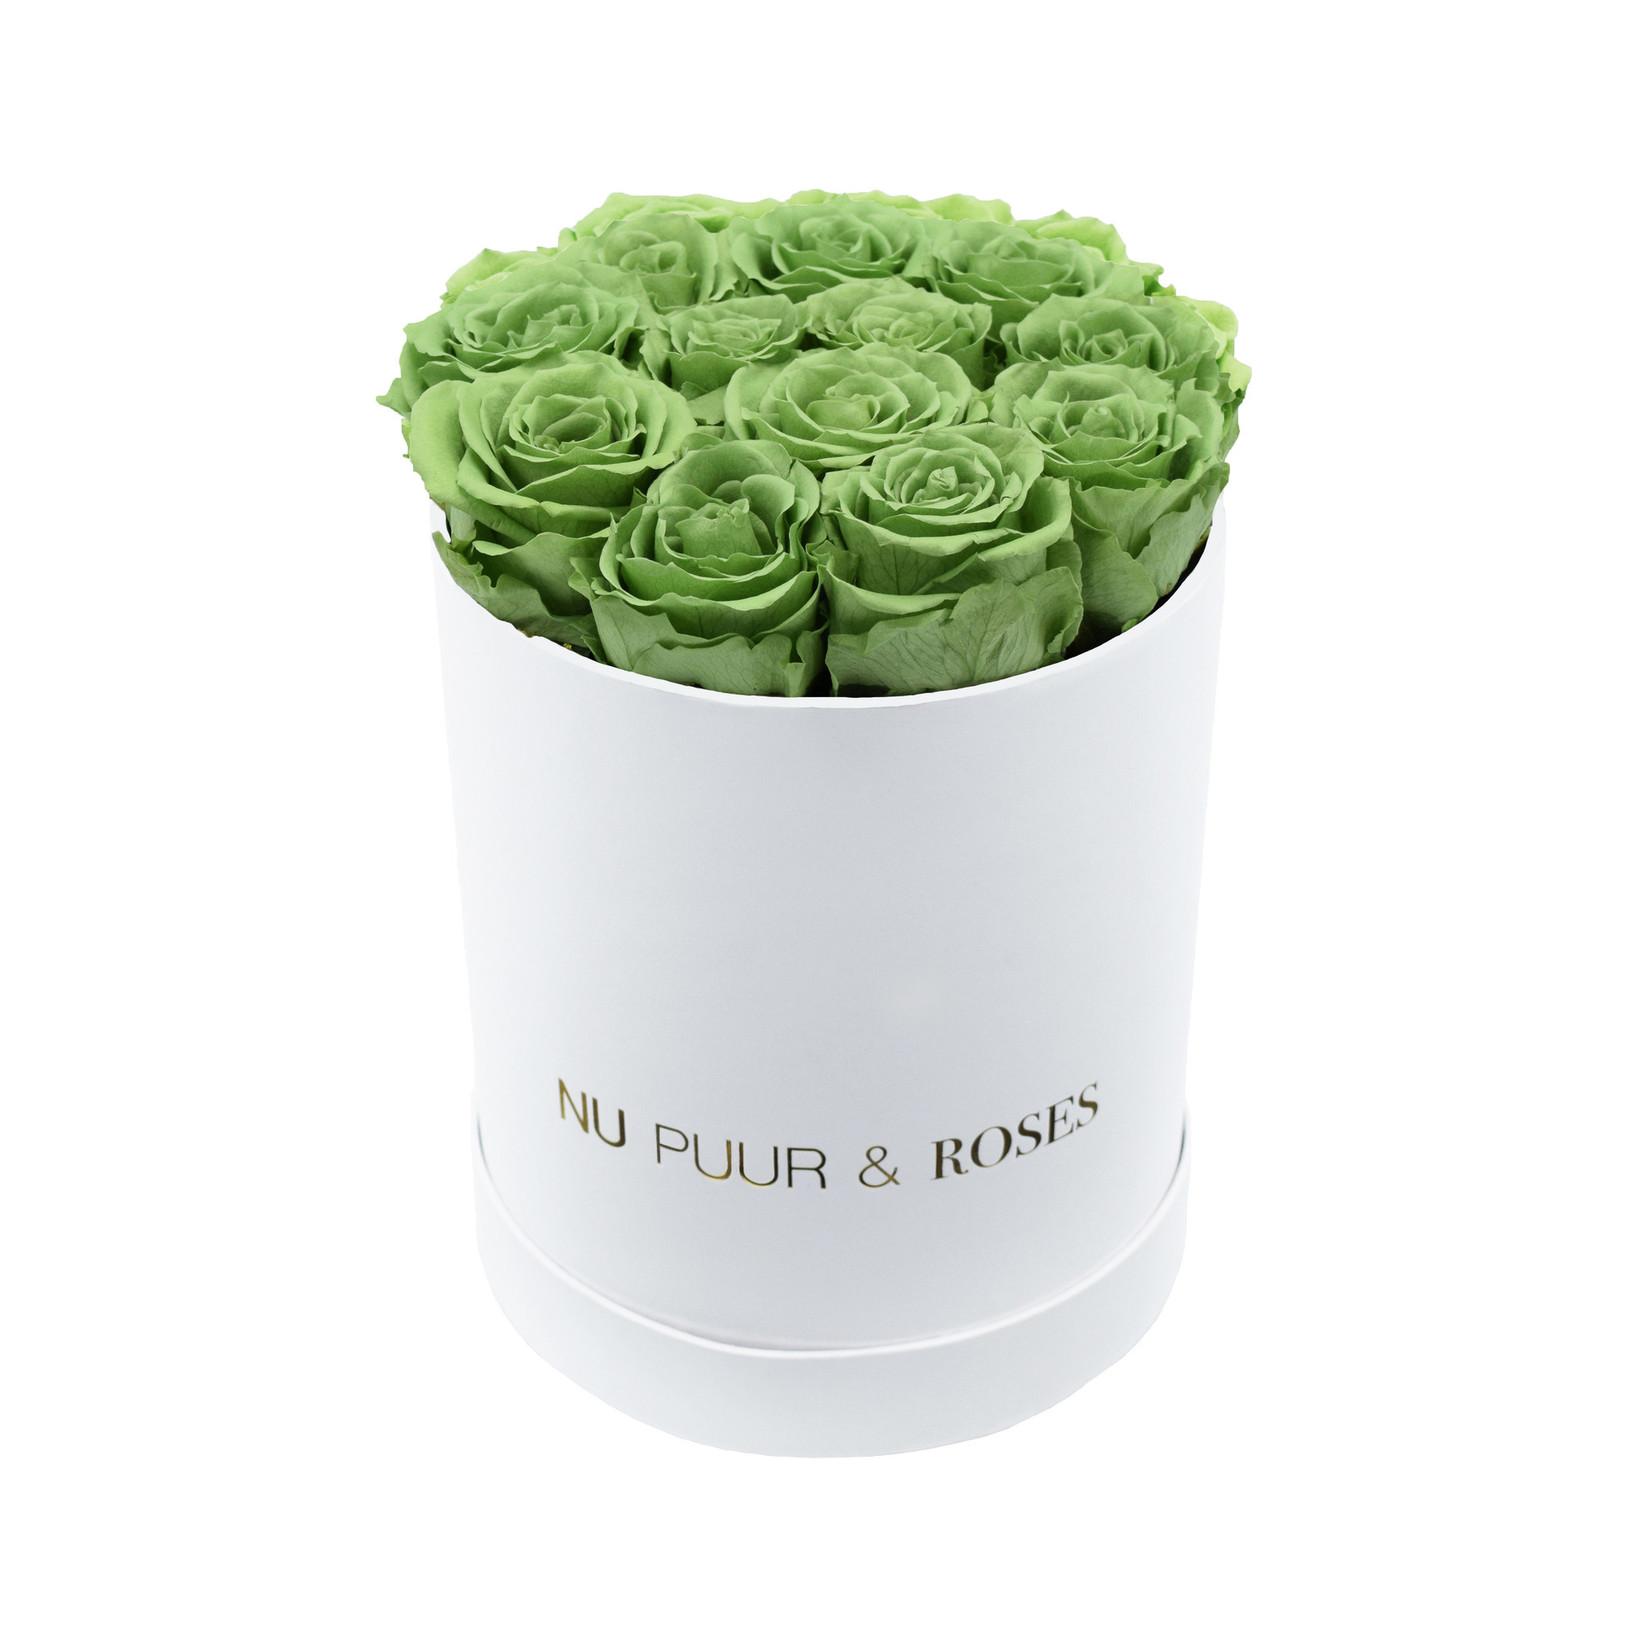 Small - Green Endless Roses - White Box